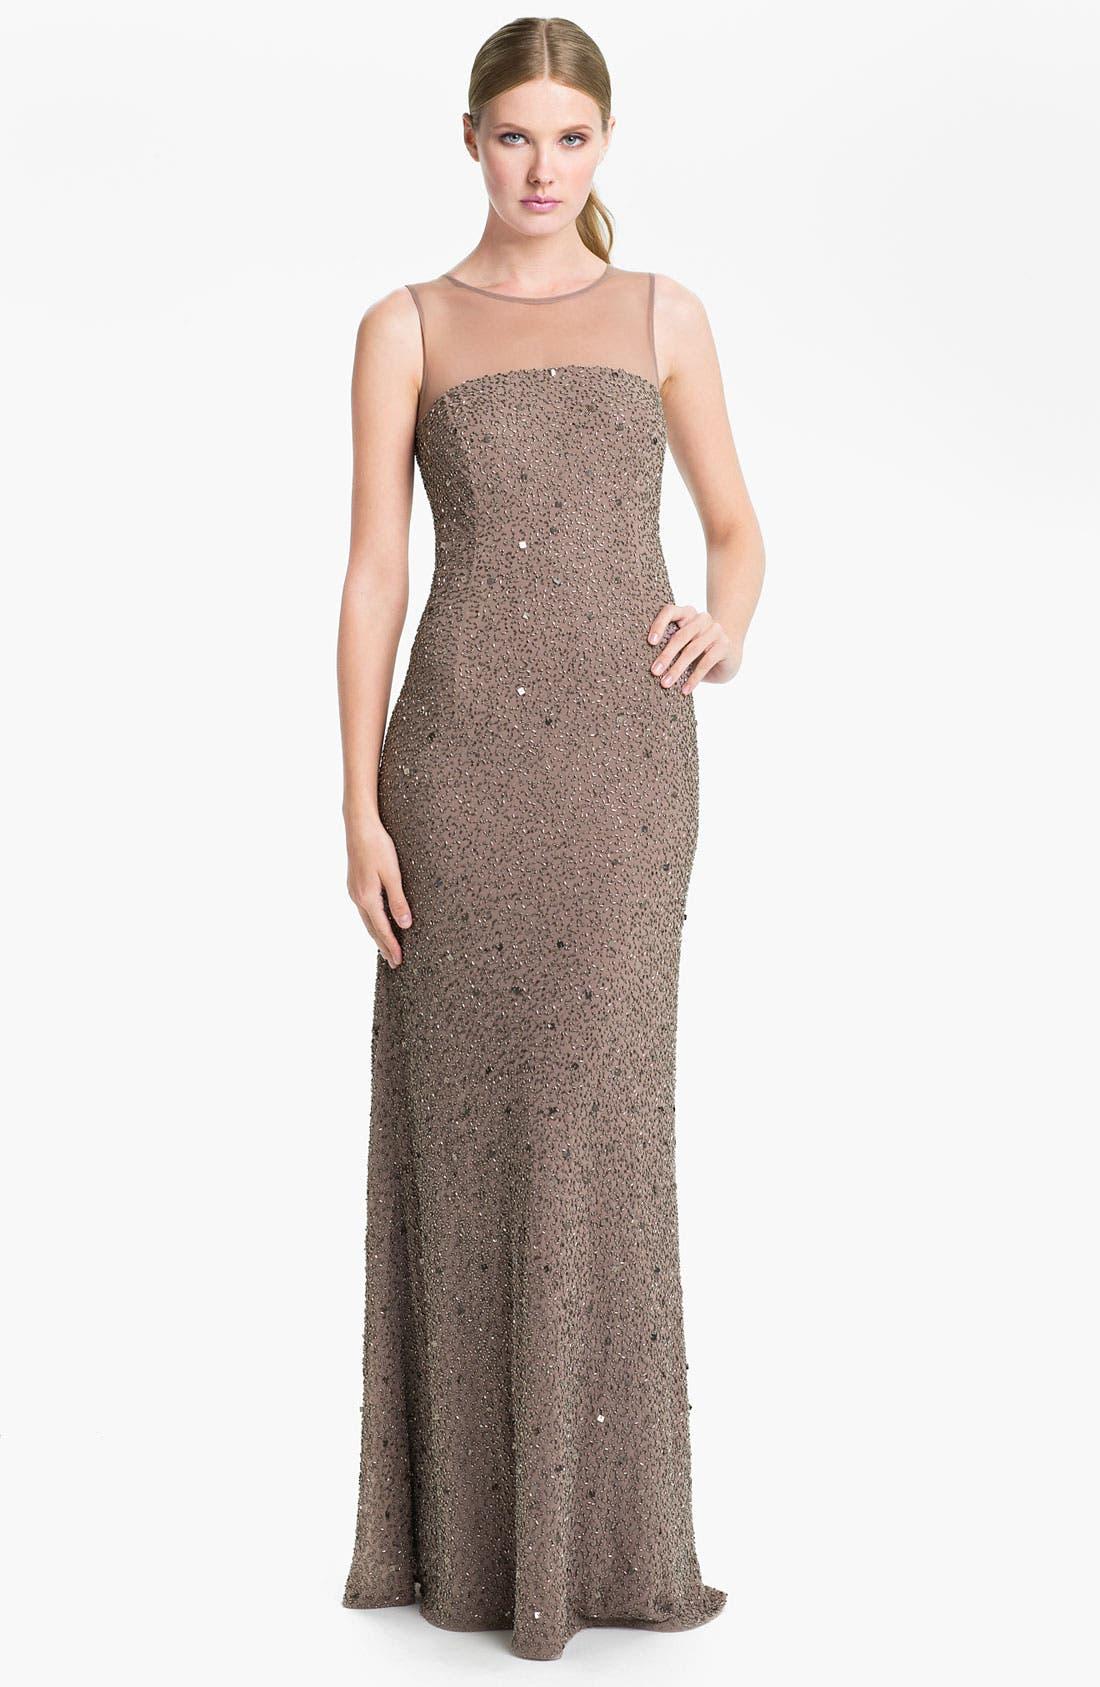 Main Image - Adrianna Papell Illusion Yoke Embellished Chiffon Gown